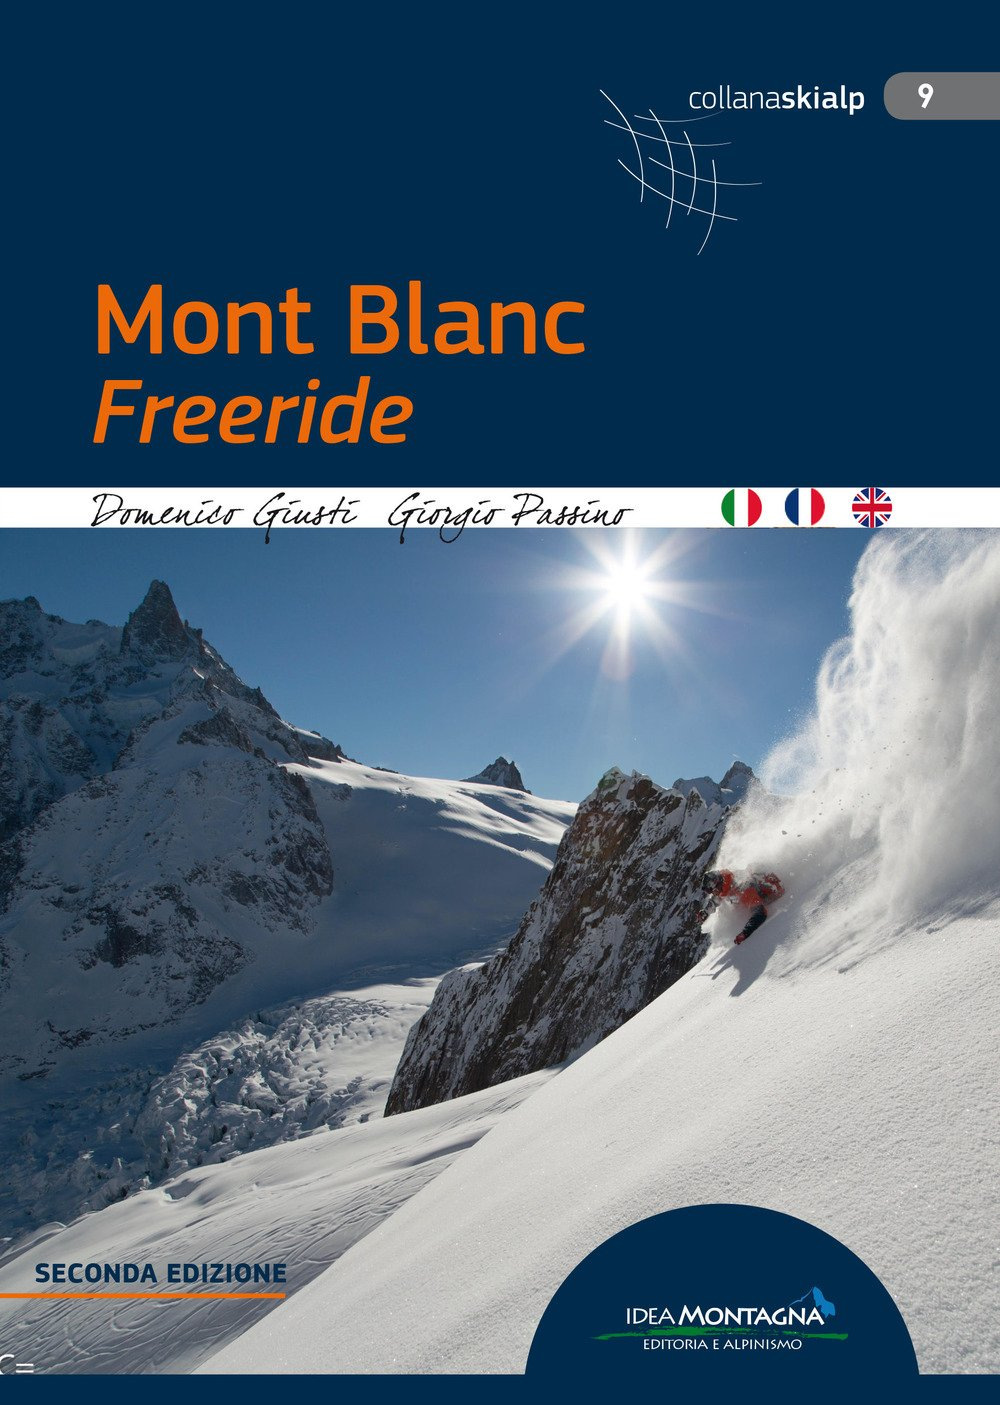 Mont Blanc   Freeride  2. Auflage